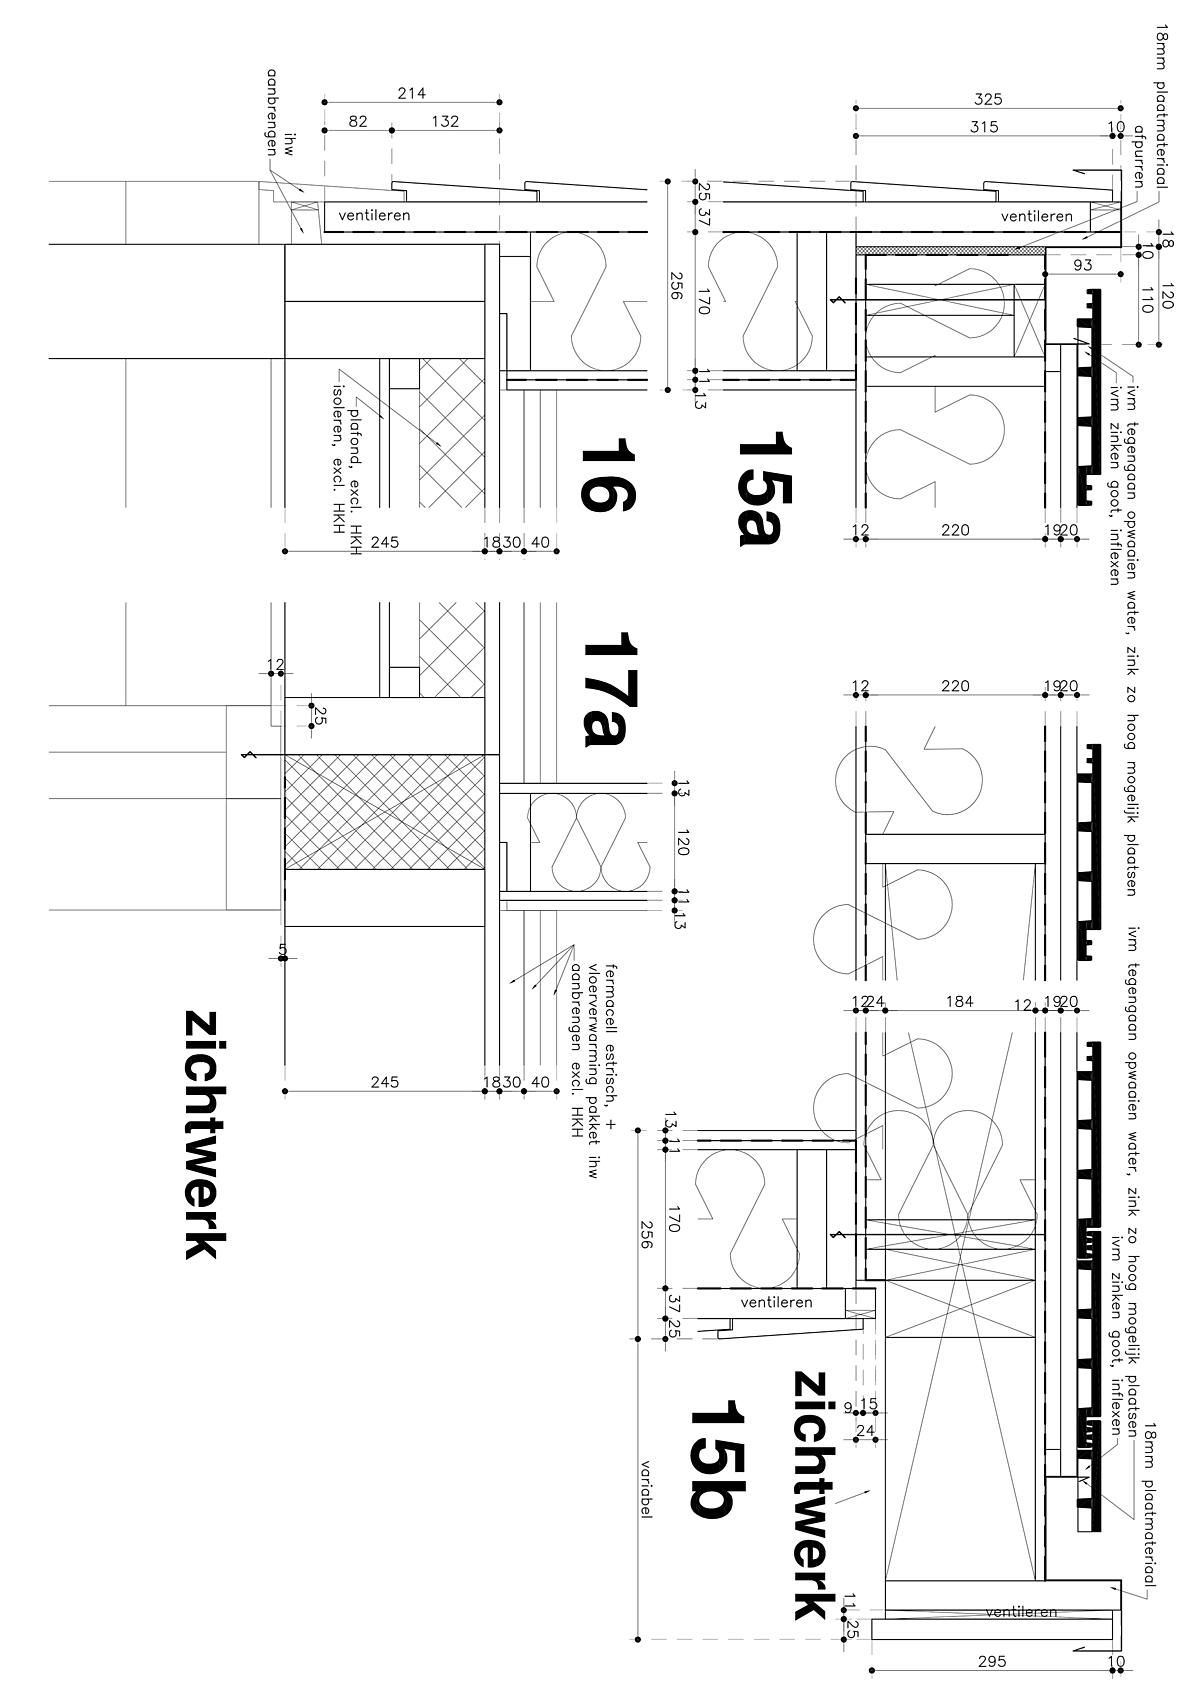 LDS Ra Vlieland UT detail3